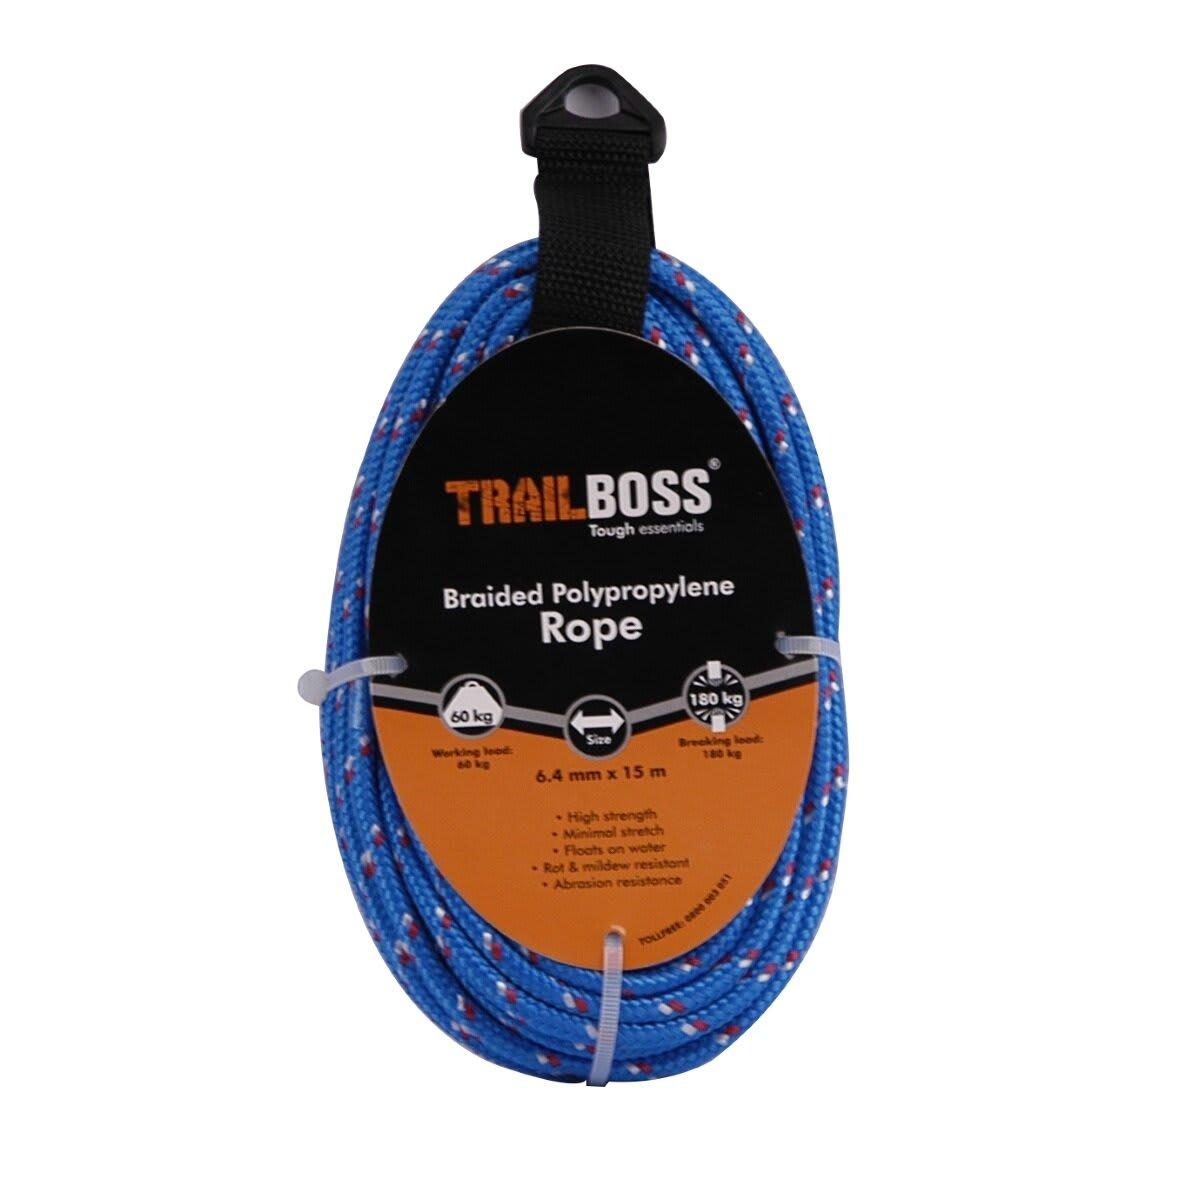 TrailBoss 6.4mm x 15m Braided Polypropylene Rope